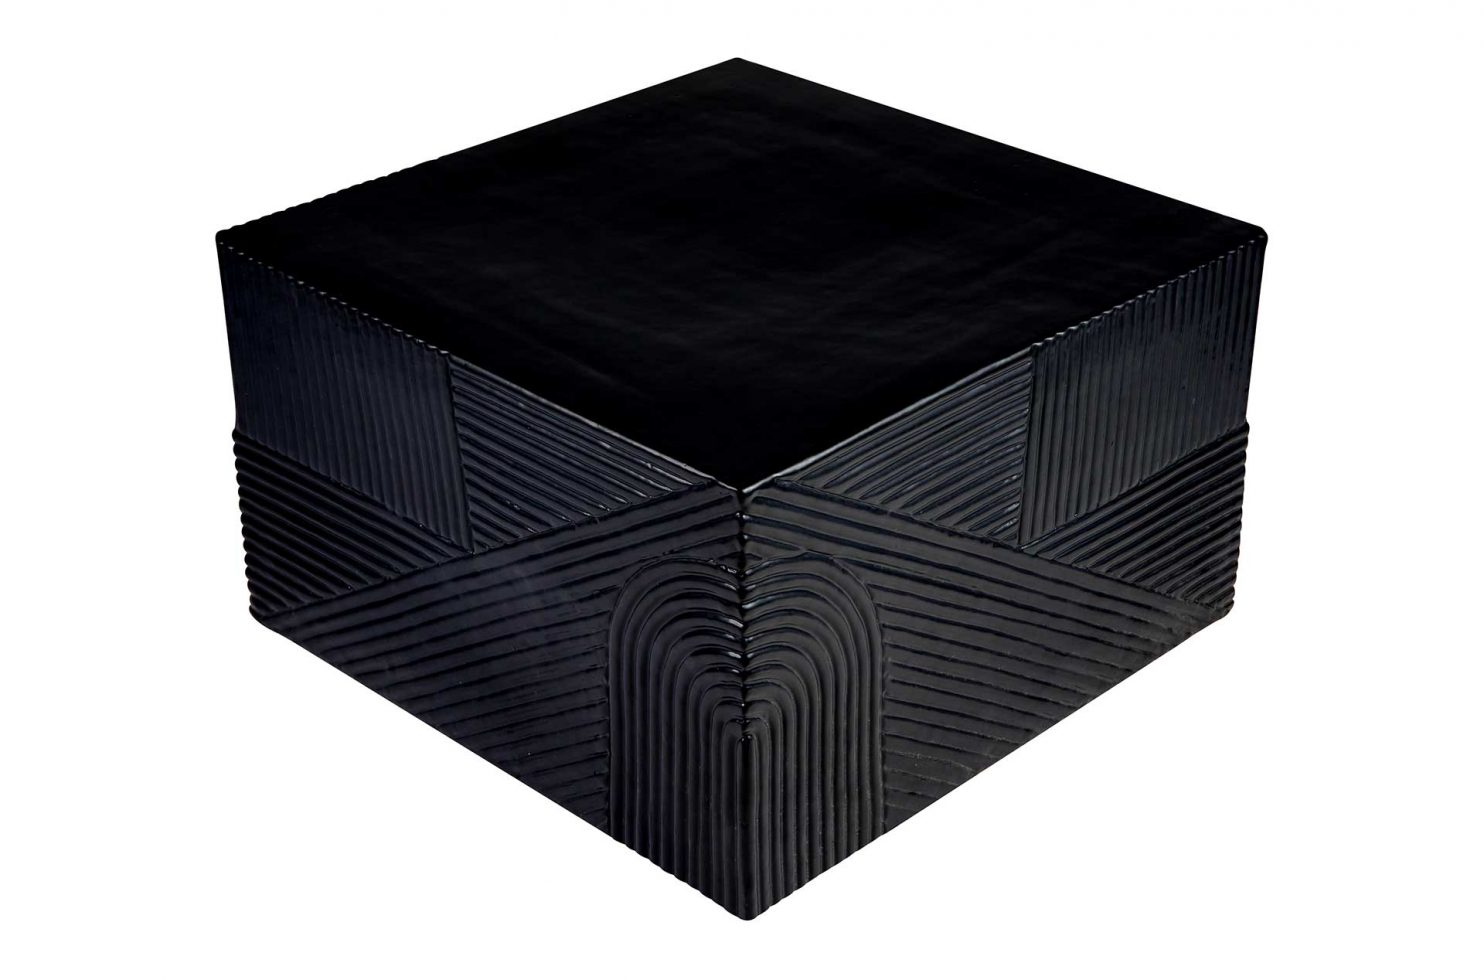 prov cer textured square table 24in C30803032 coal above corner web